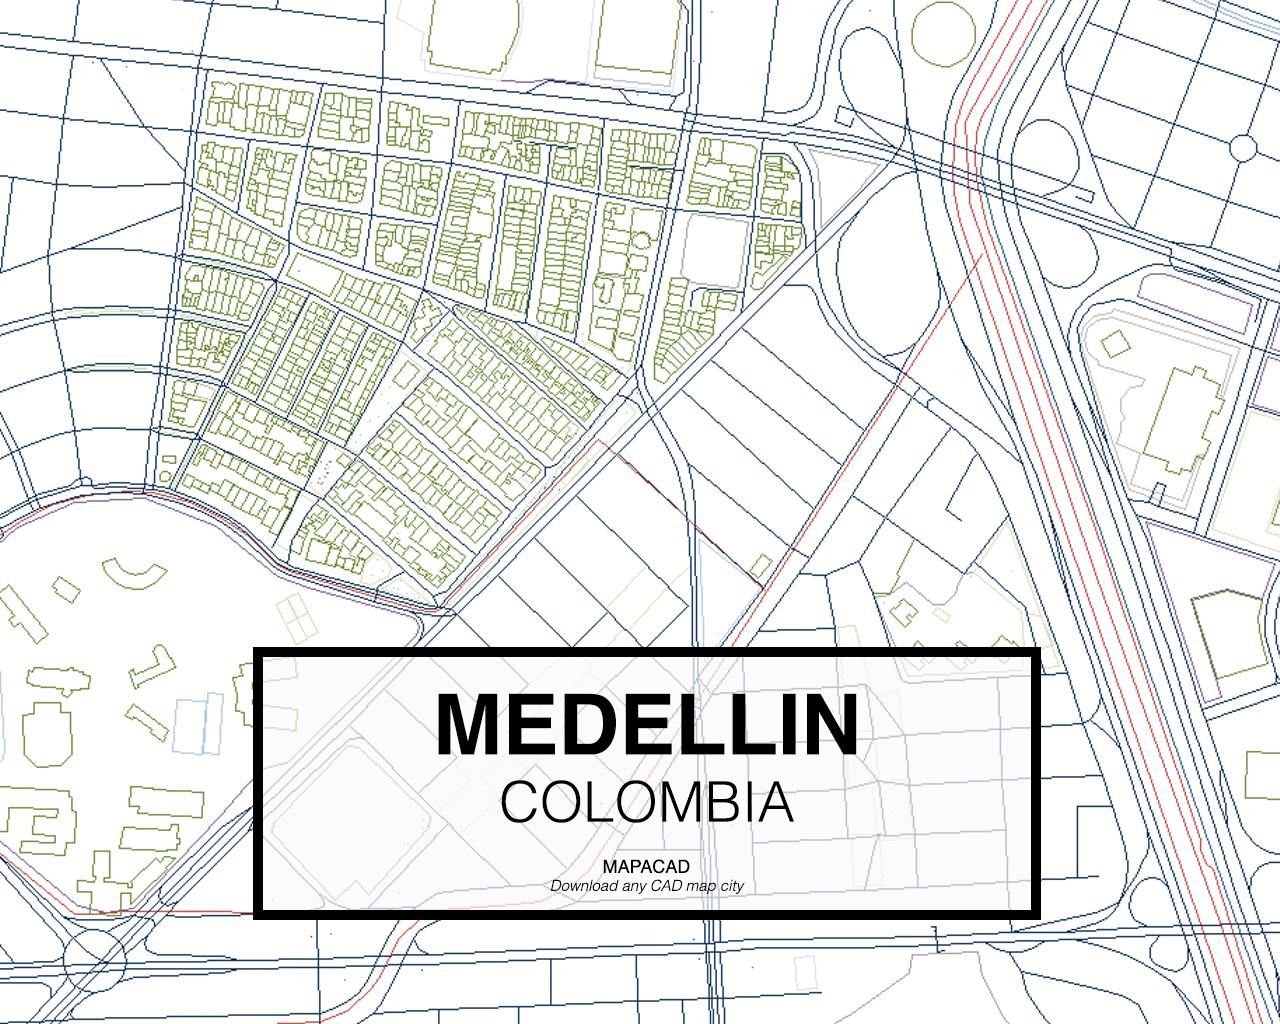 Medellin medellin colombia 03 mapacad download map cad dwg gumiabroncs Gallery